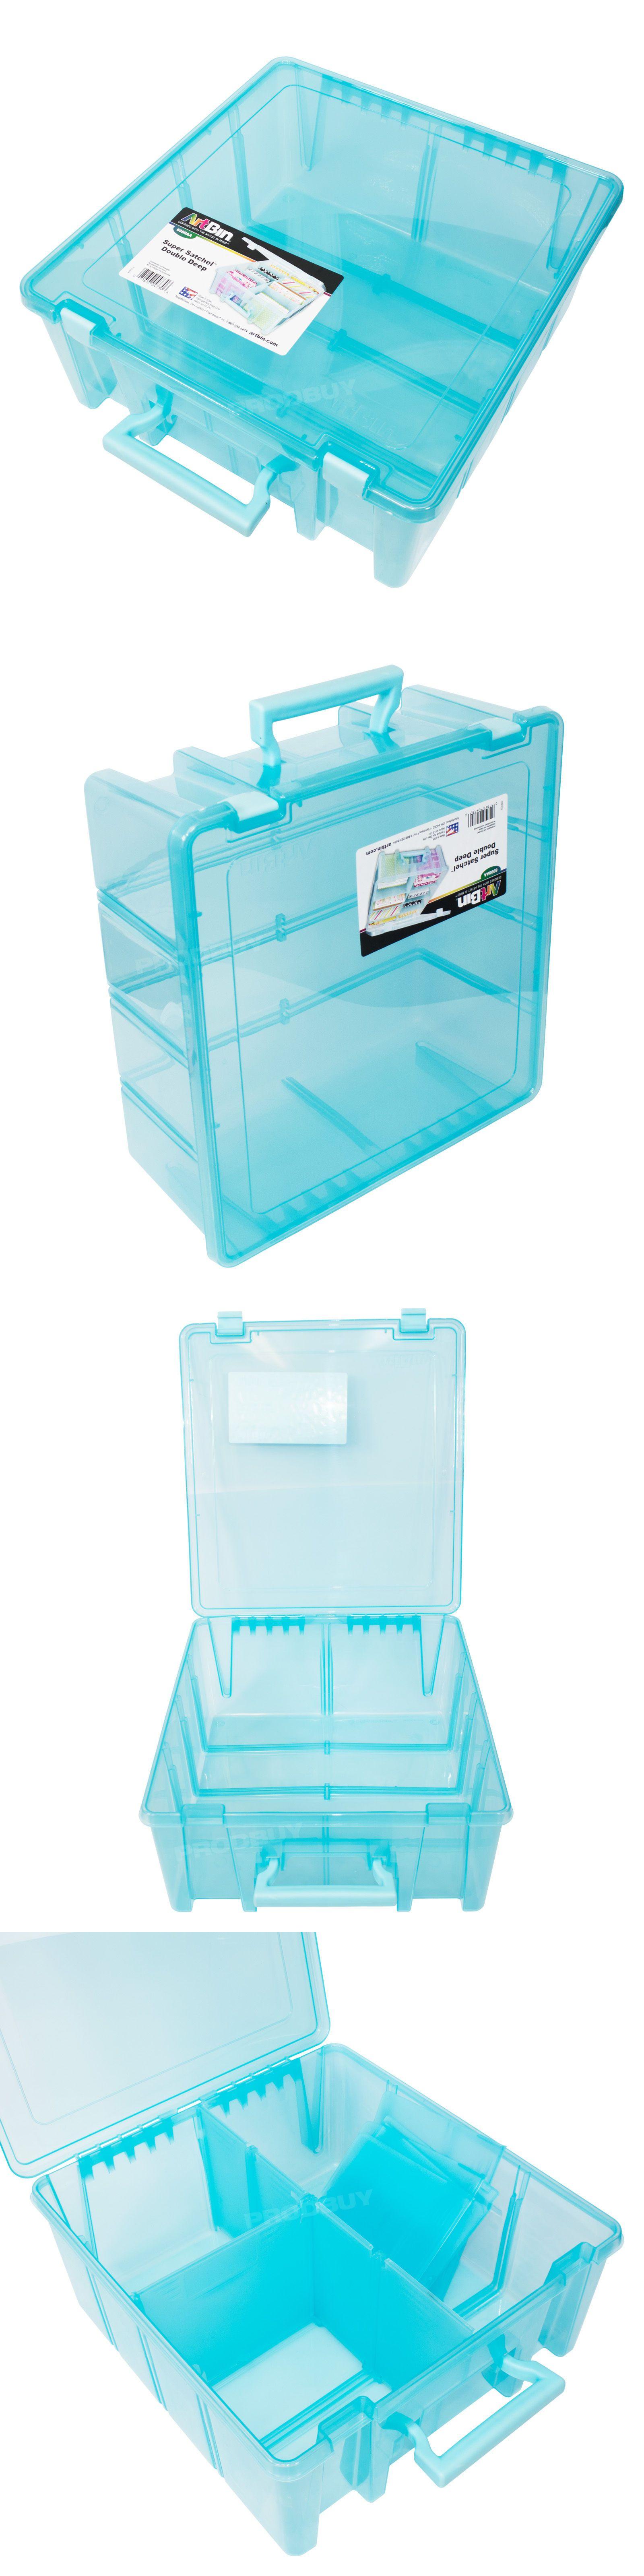 Drawing Supplies Storage Artist S Large Tool Box